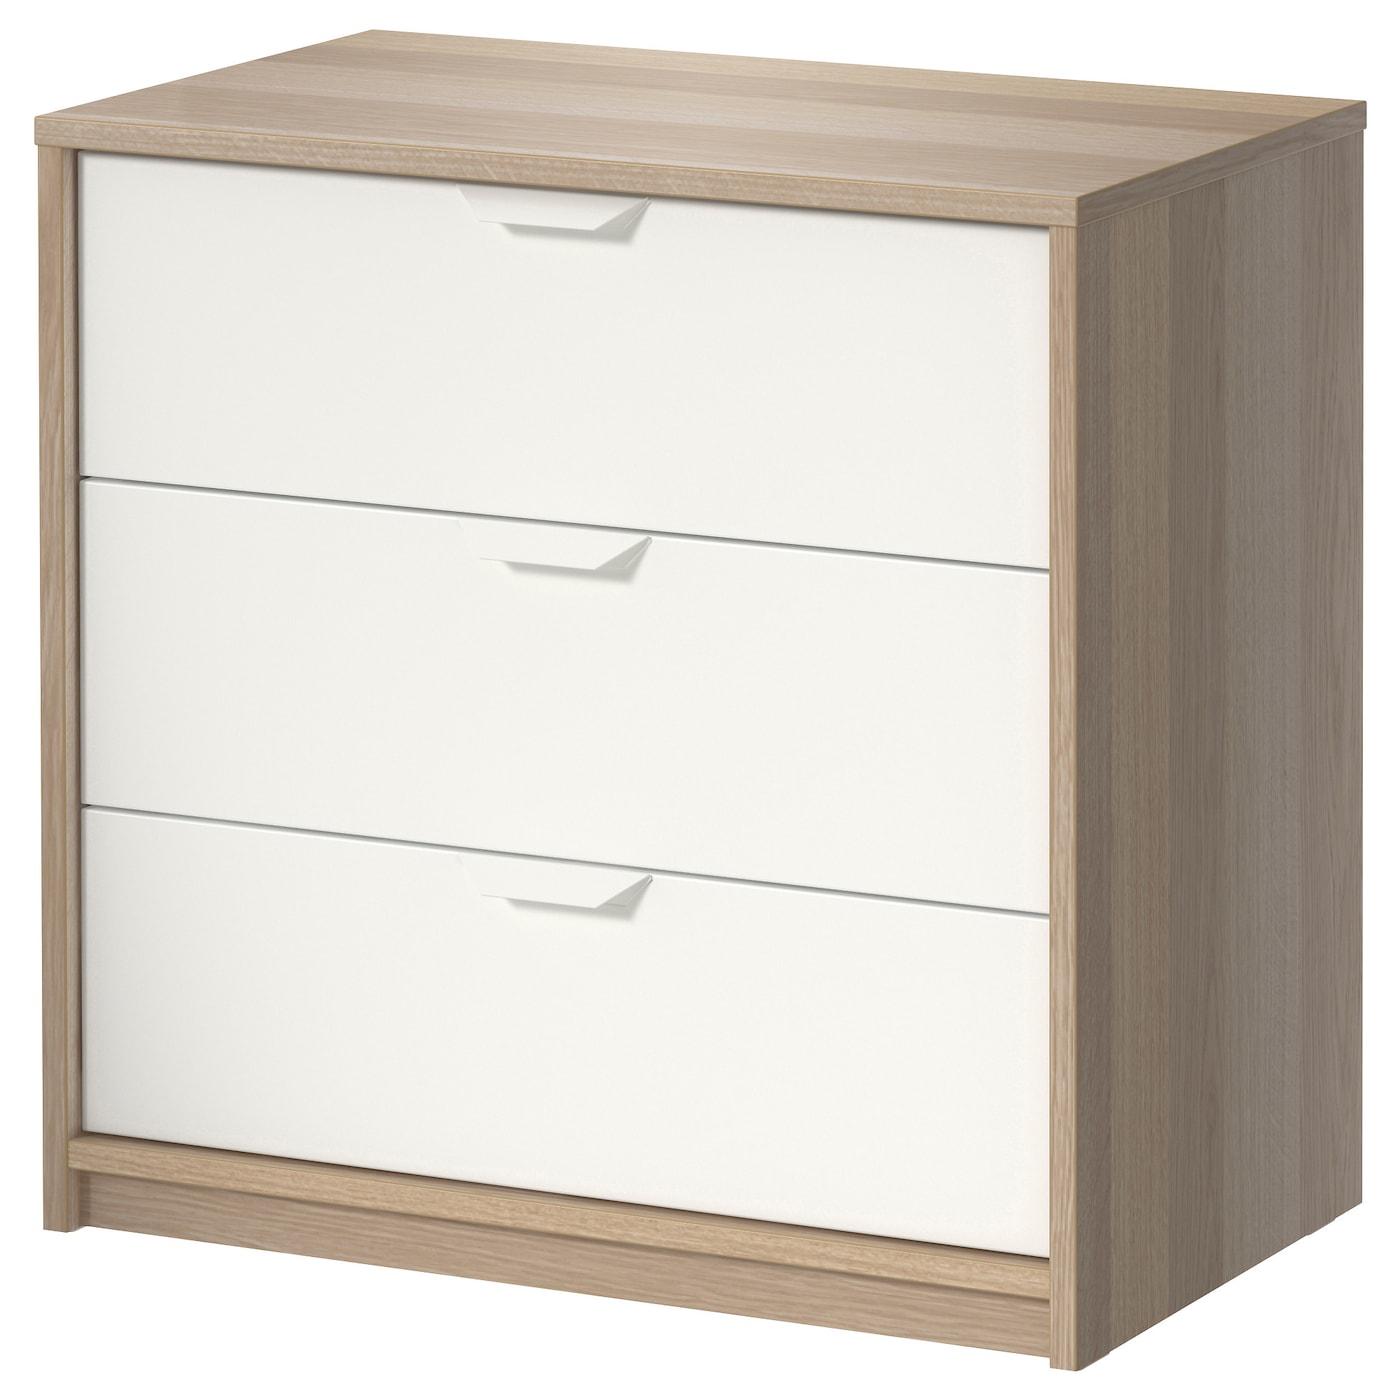 kommode 1 50 breit gallery of kommode cm breit schildmeyer apisa a breite cm kommode cm breit. Black Bedroom Furniture Sets. Home Design Ideas